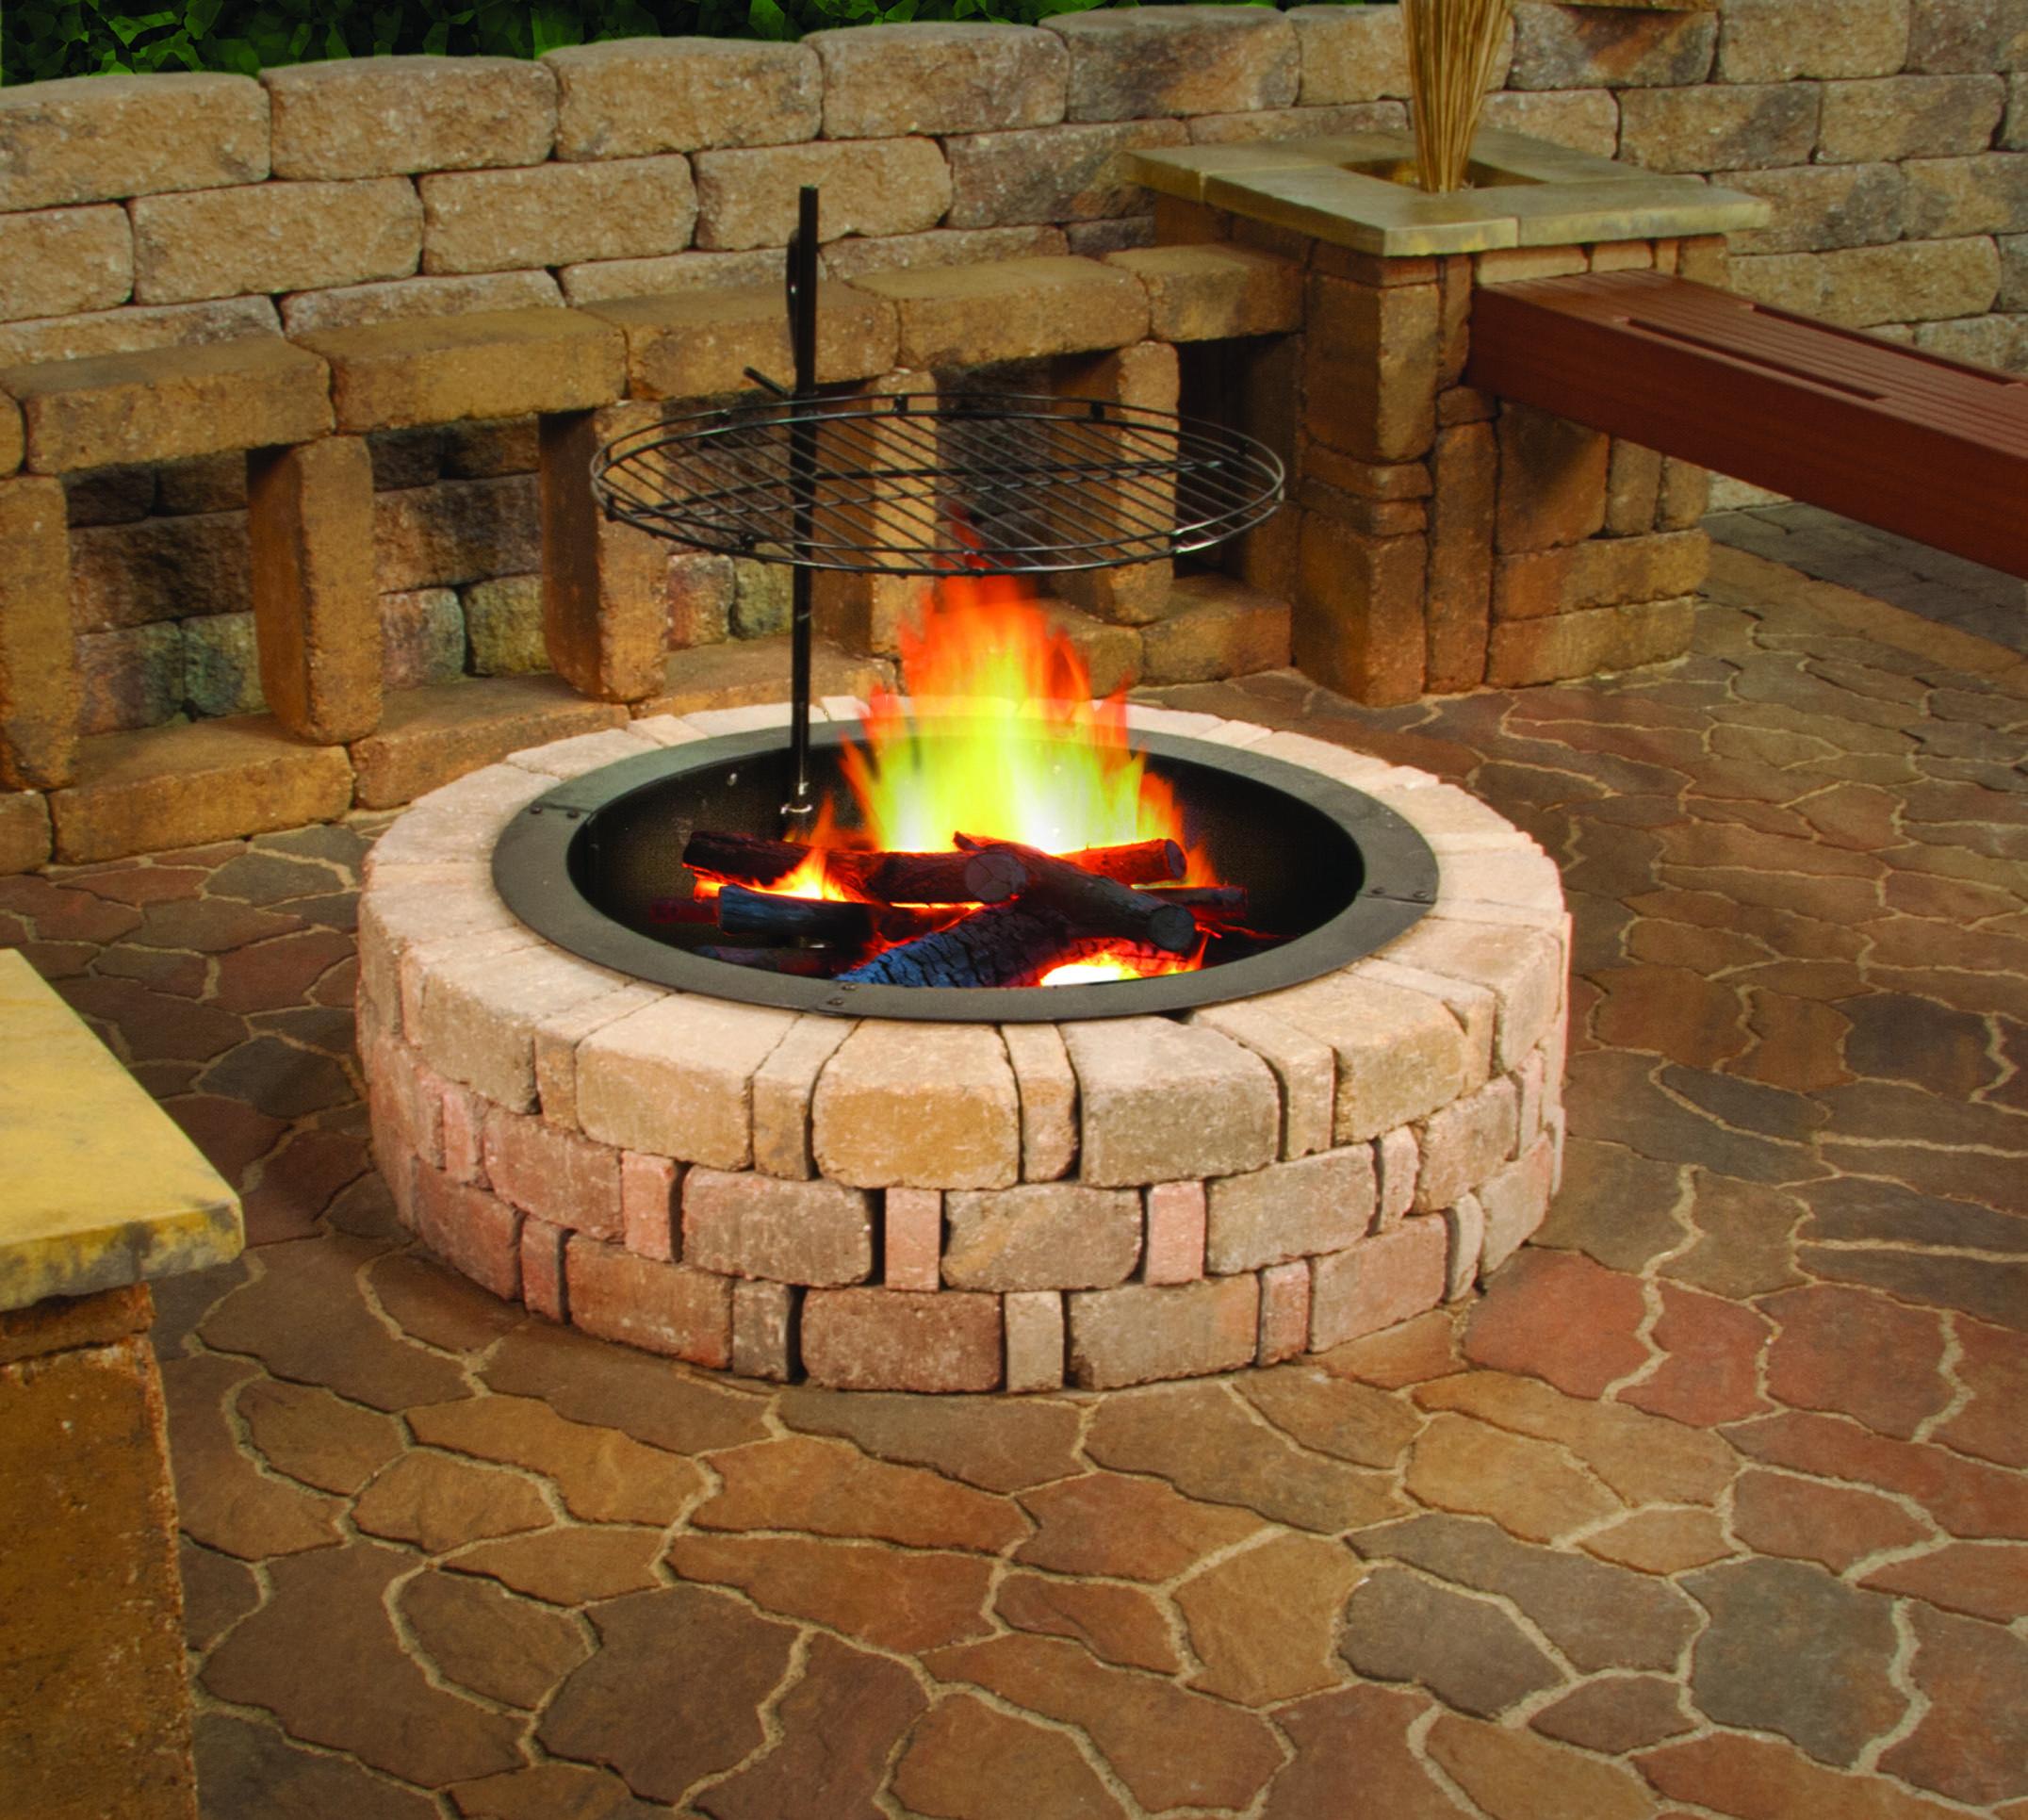 An Excellent Diy Firepit Option Http Www Menards Com Main P 2314778 Htm Utm Source Pinterest Utm Med Patio Landscape Design Outdoor Fire Pit Outdoor Heating